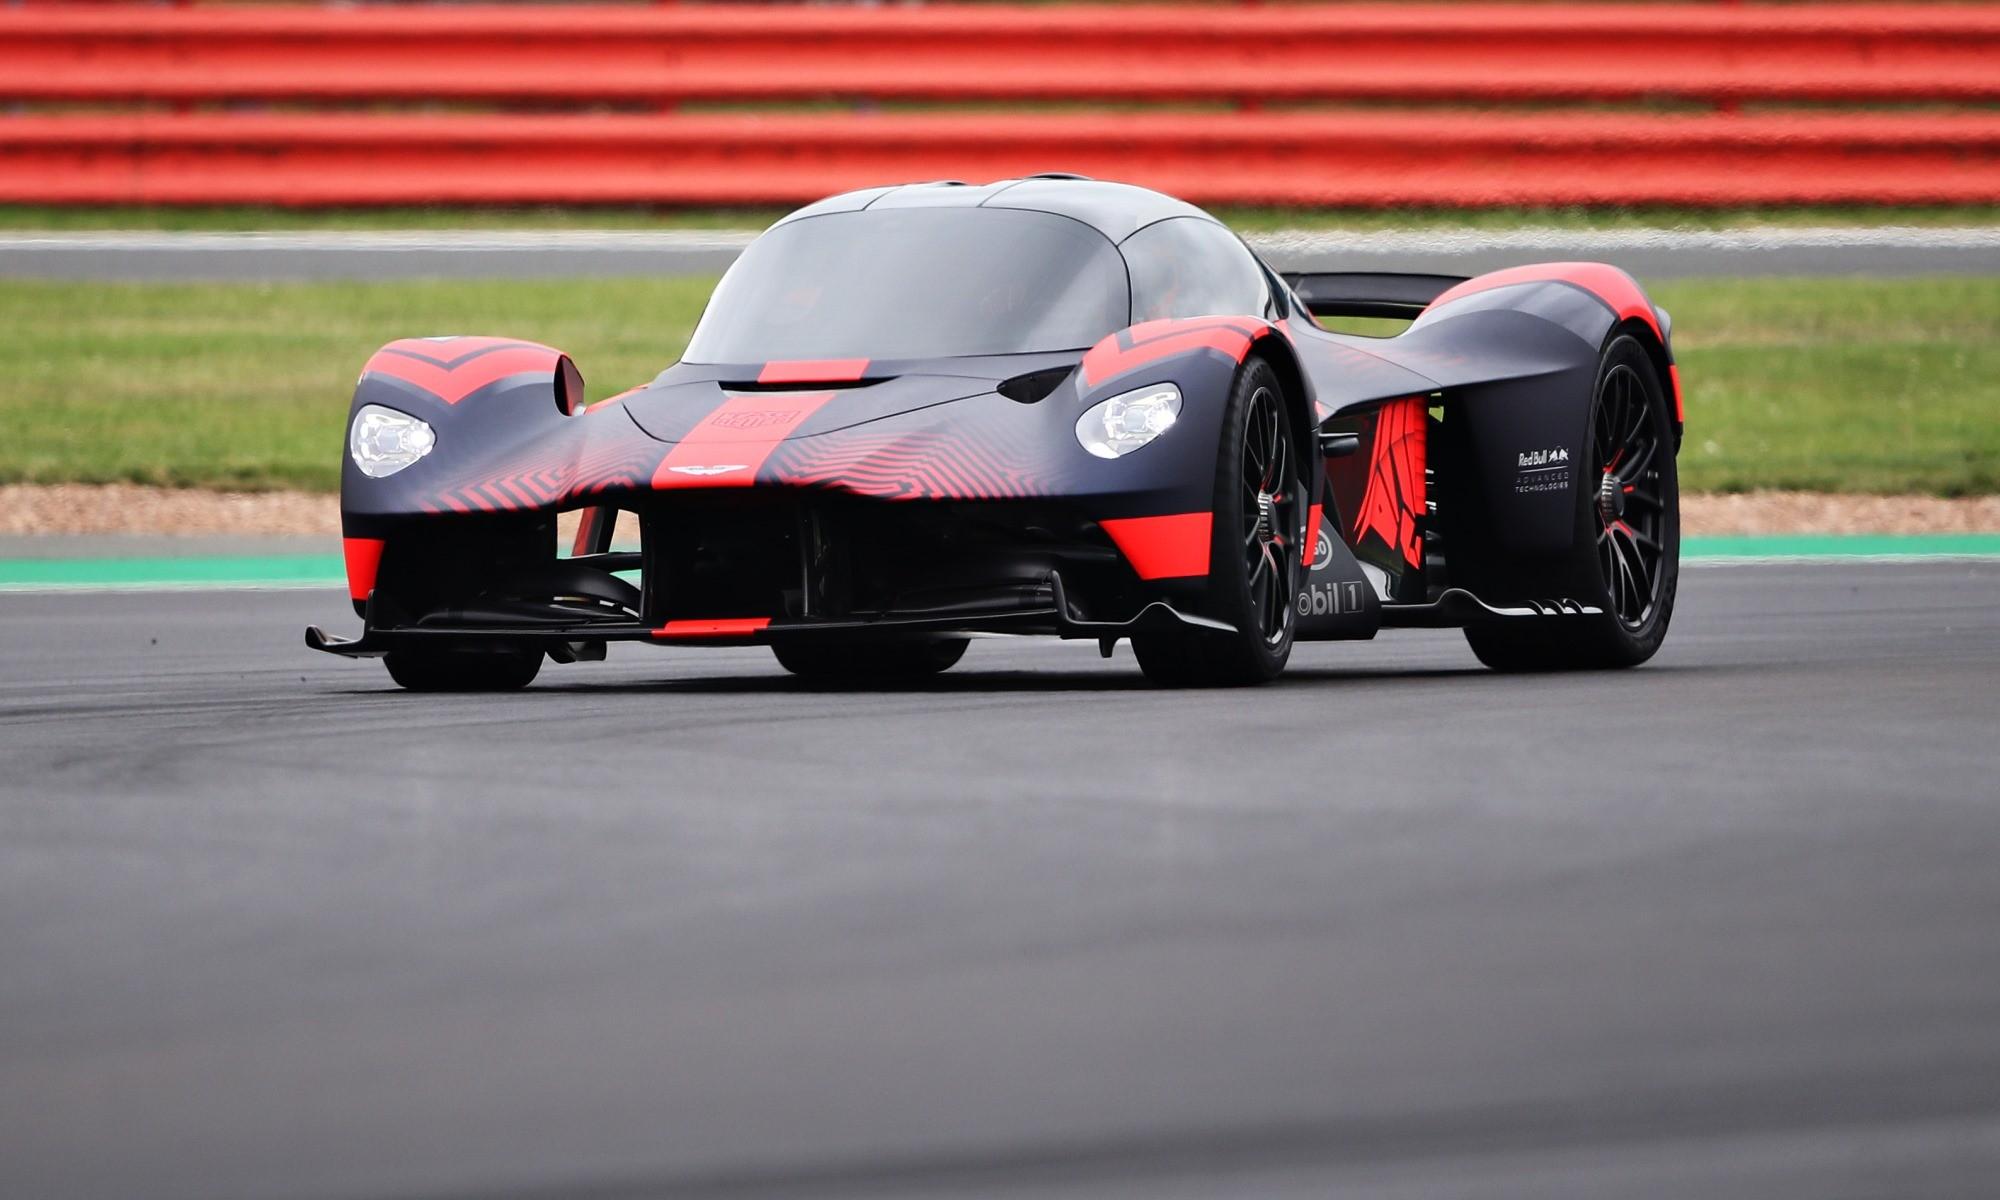 Aston Martin public debut cornering